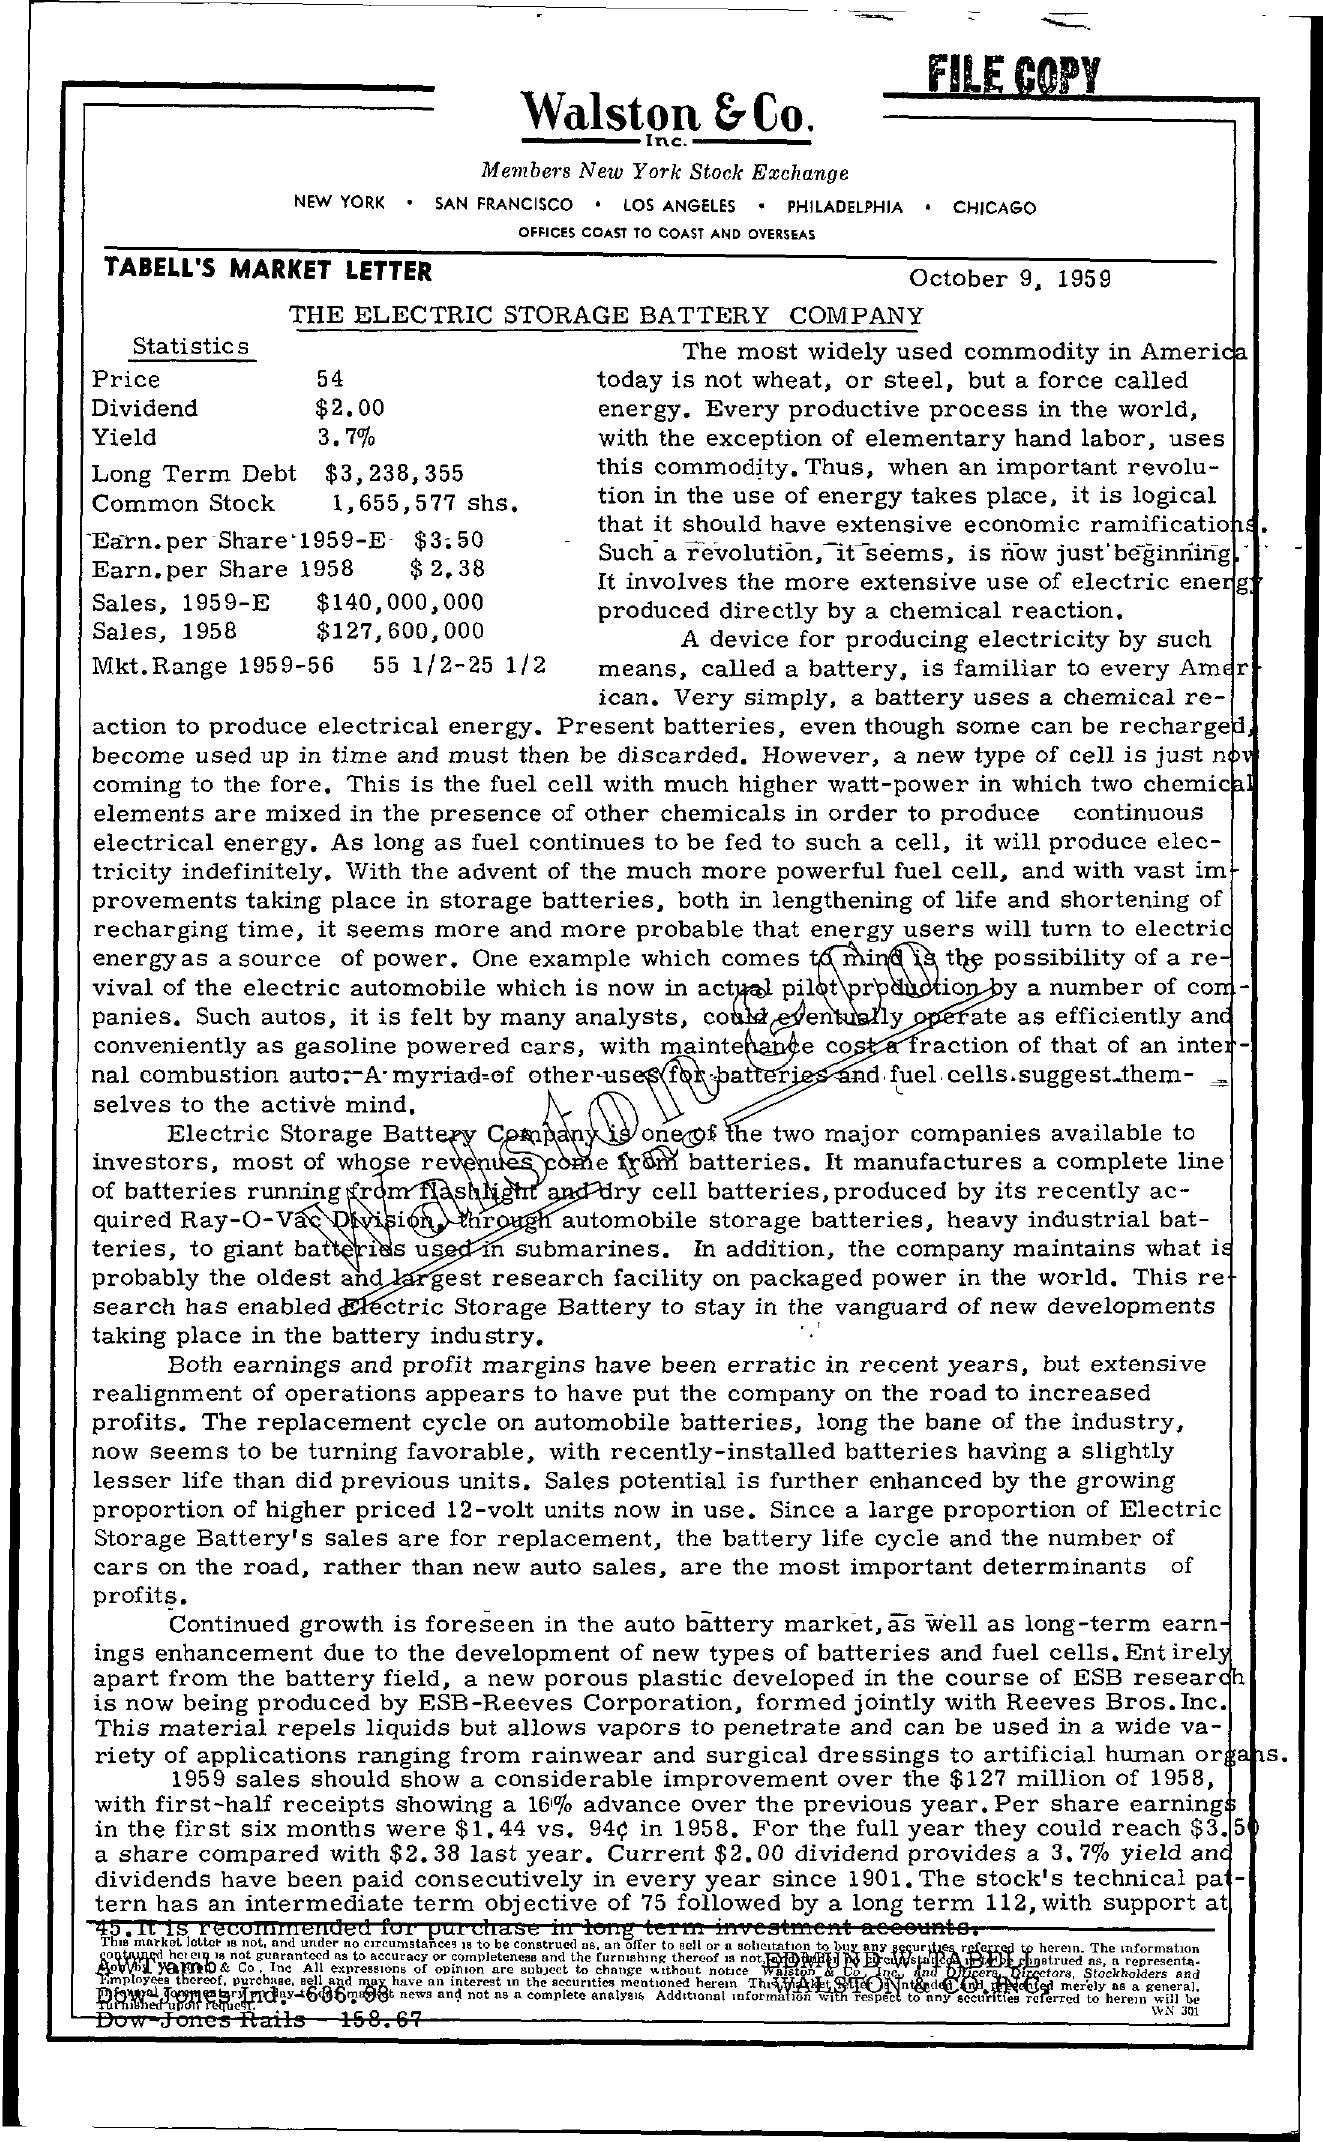 Tabell's Market Letter - October 09, 1959